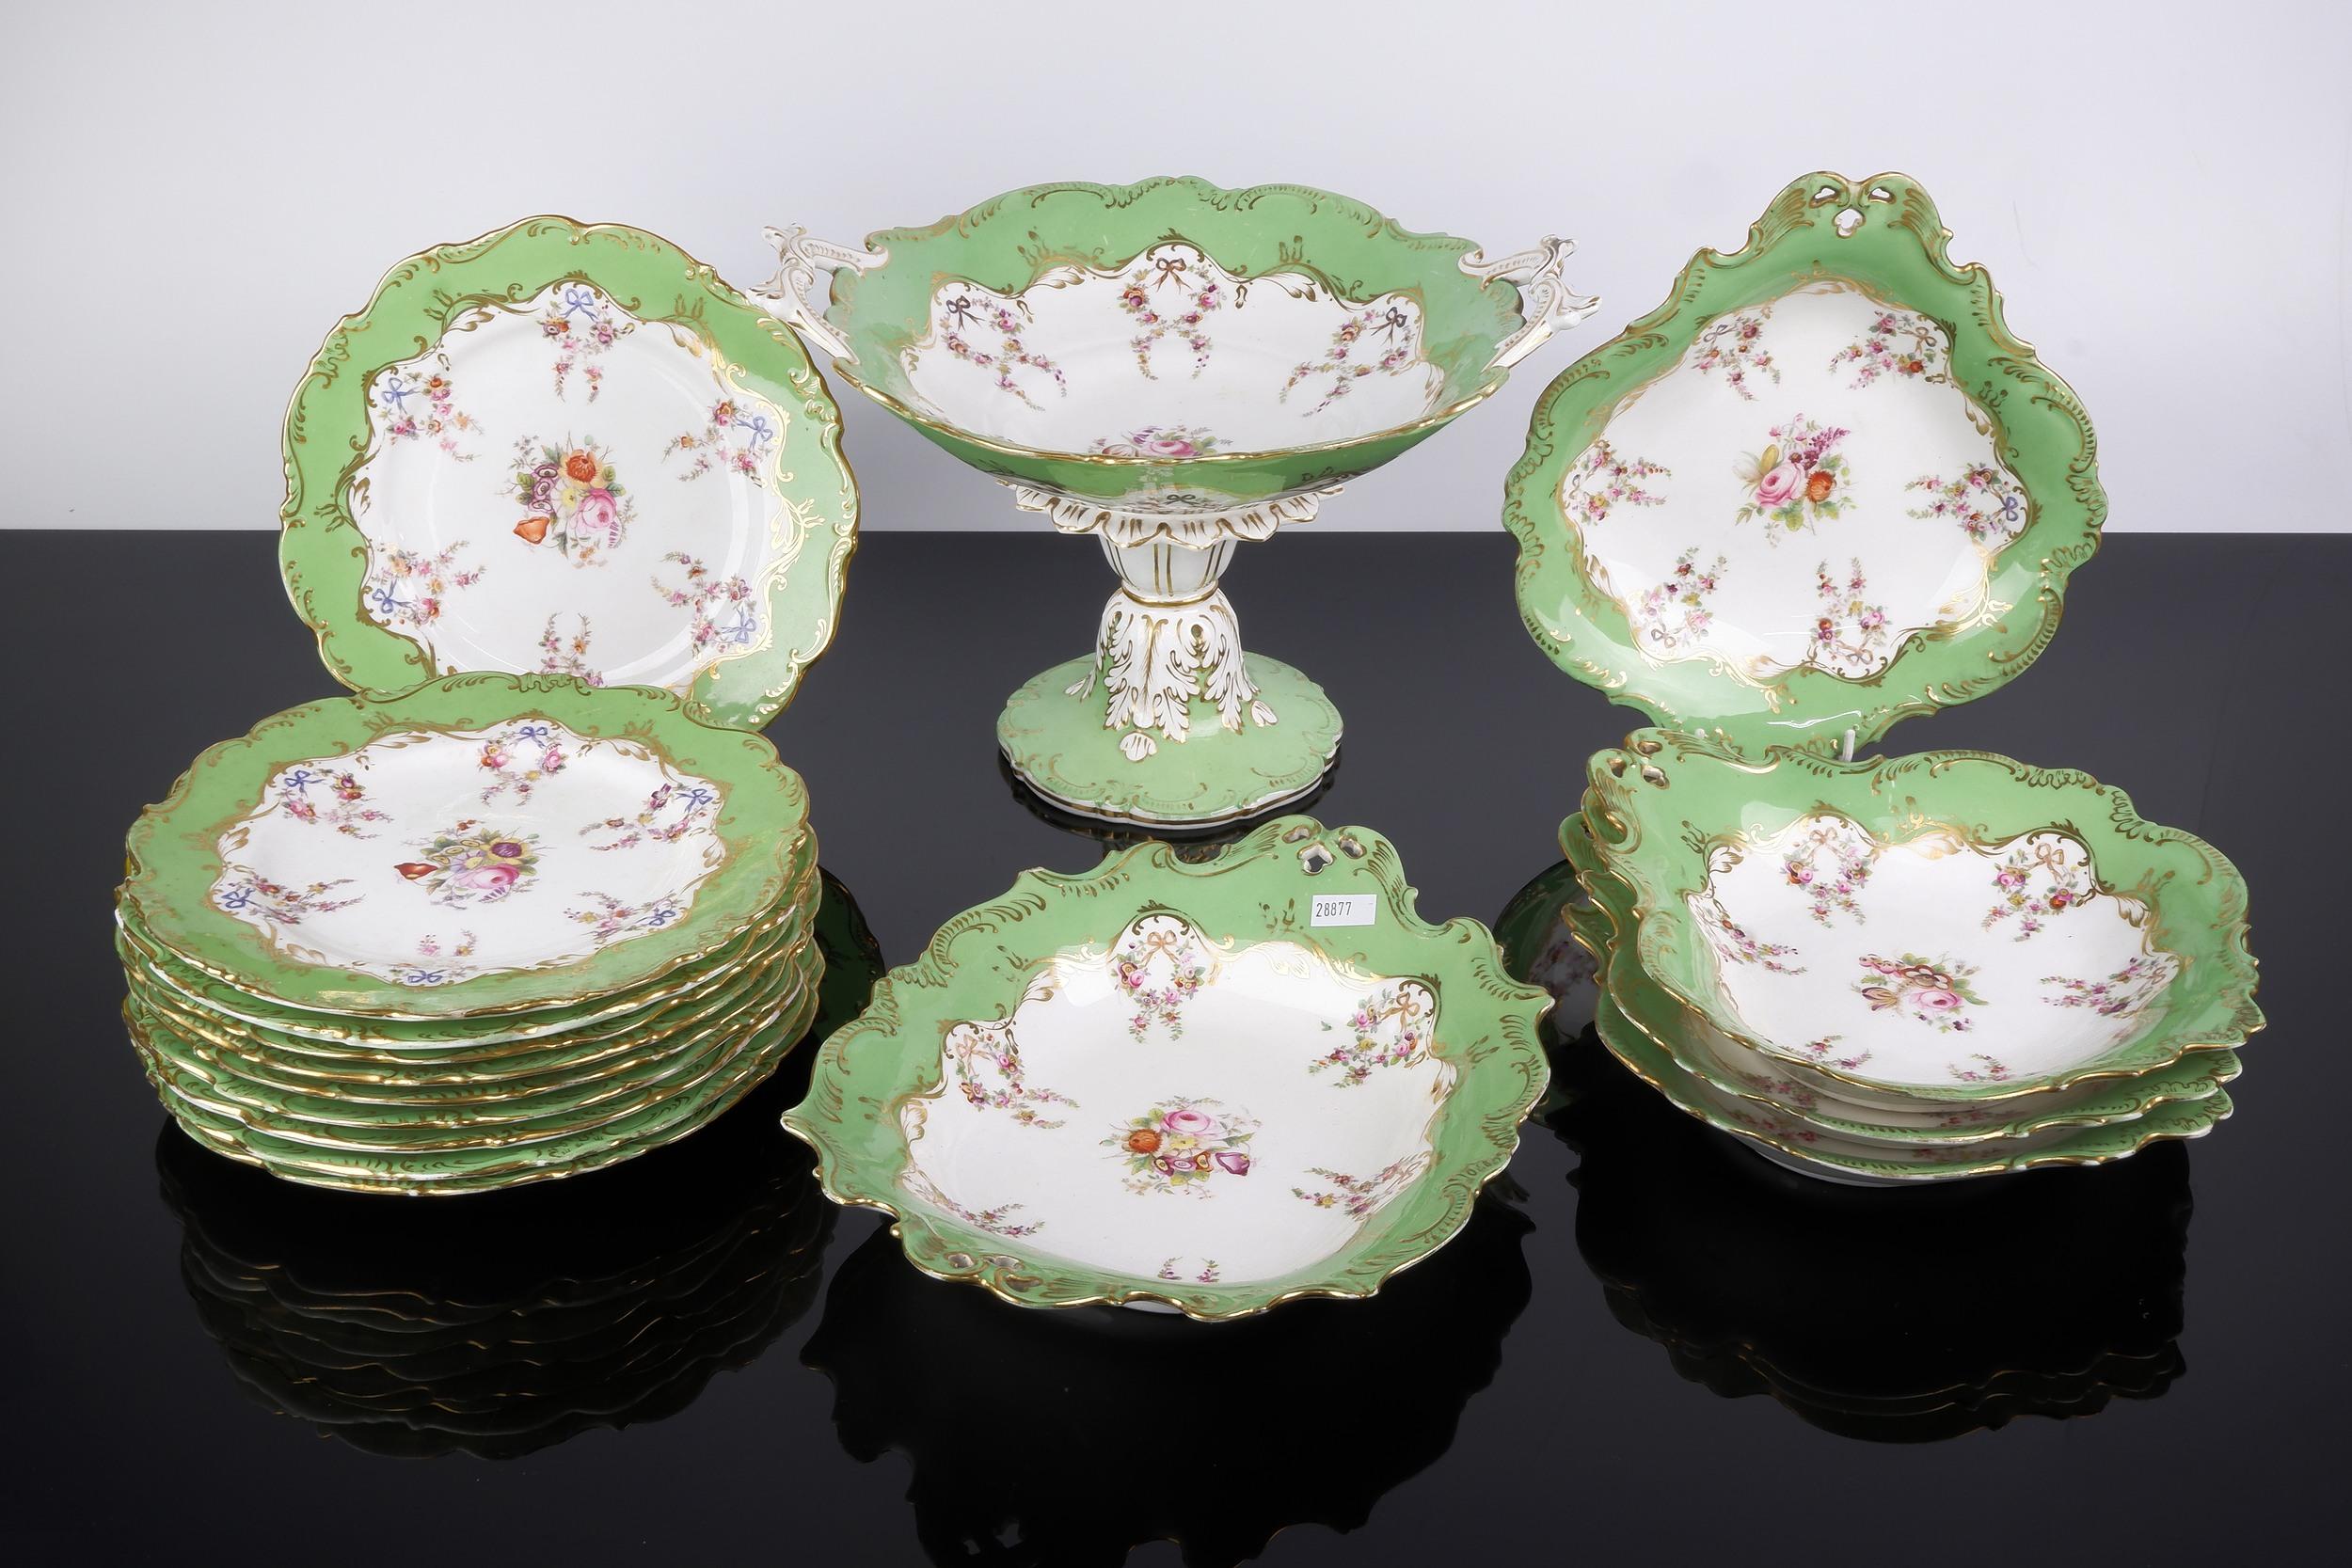 'Rockingham Porcelain Hand Painted Dessert Service, Circa 1830'